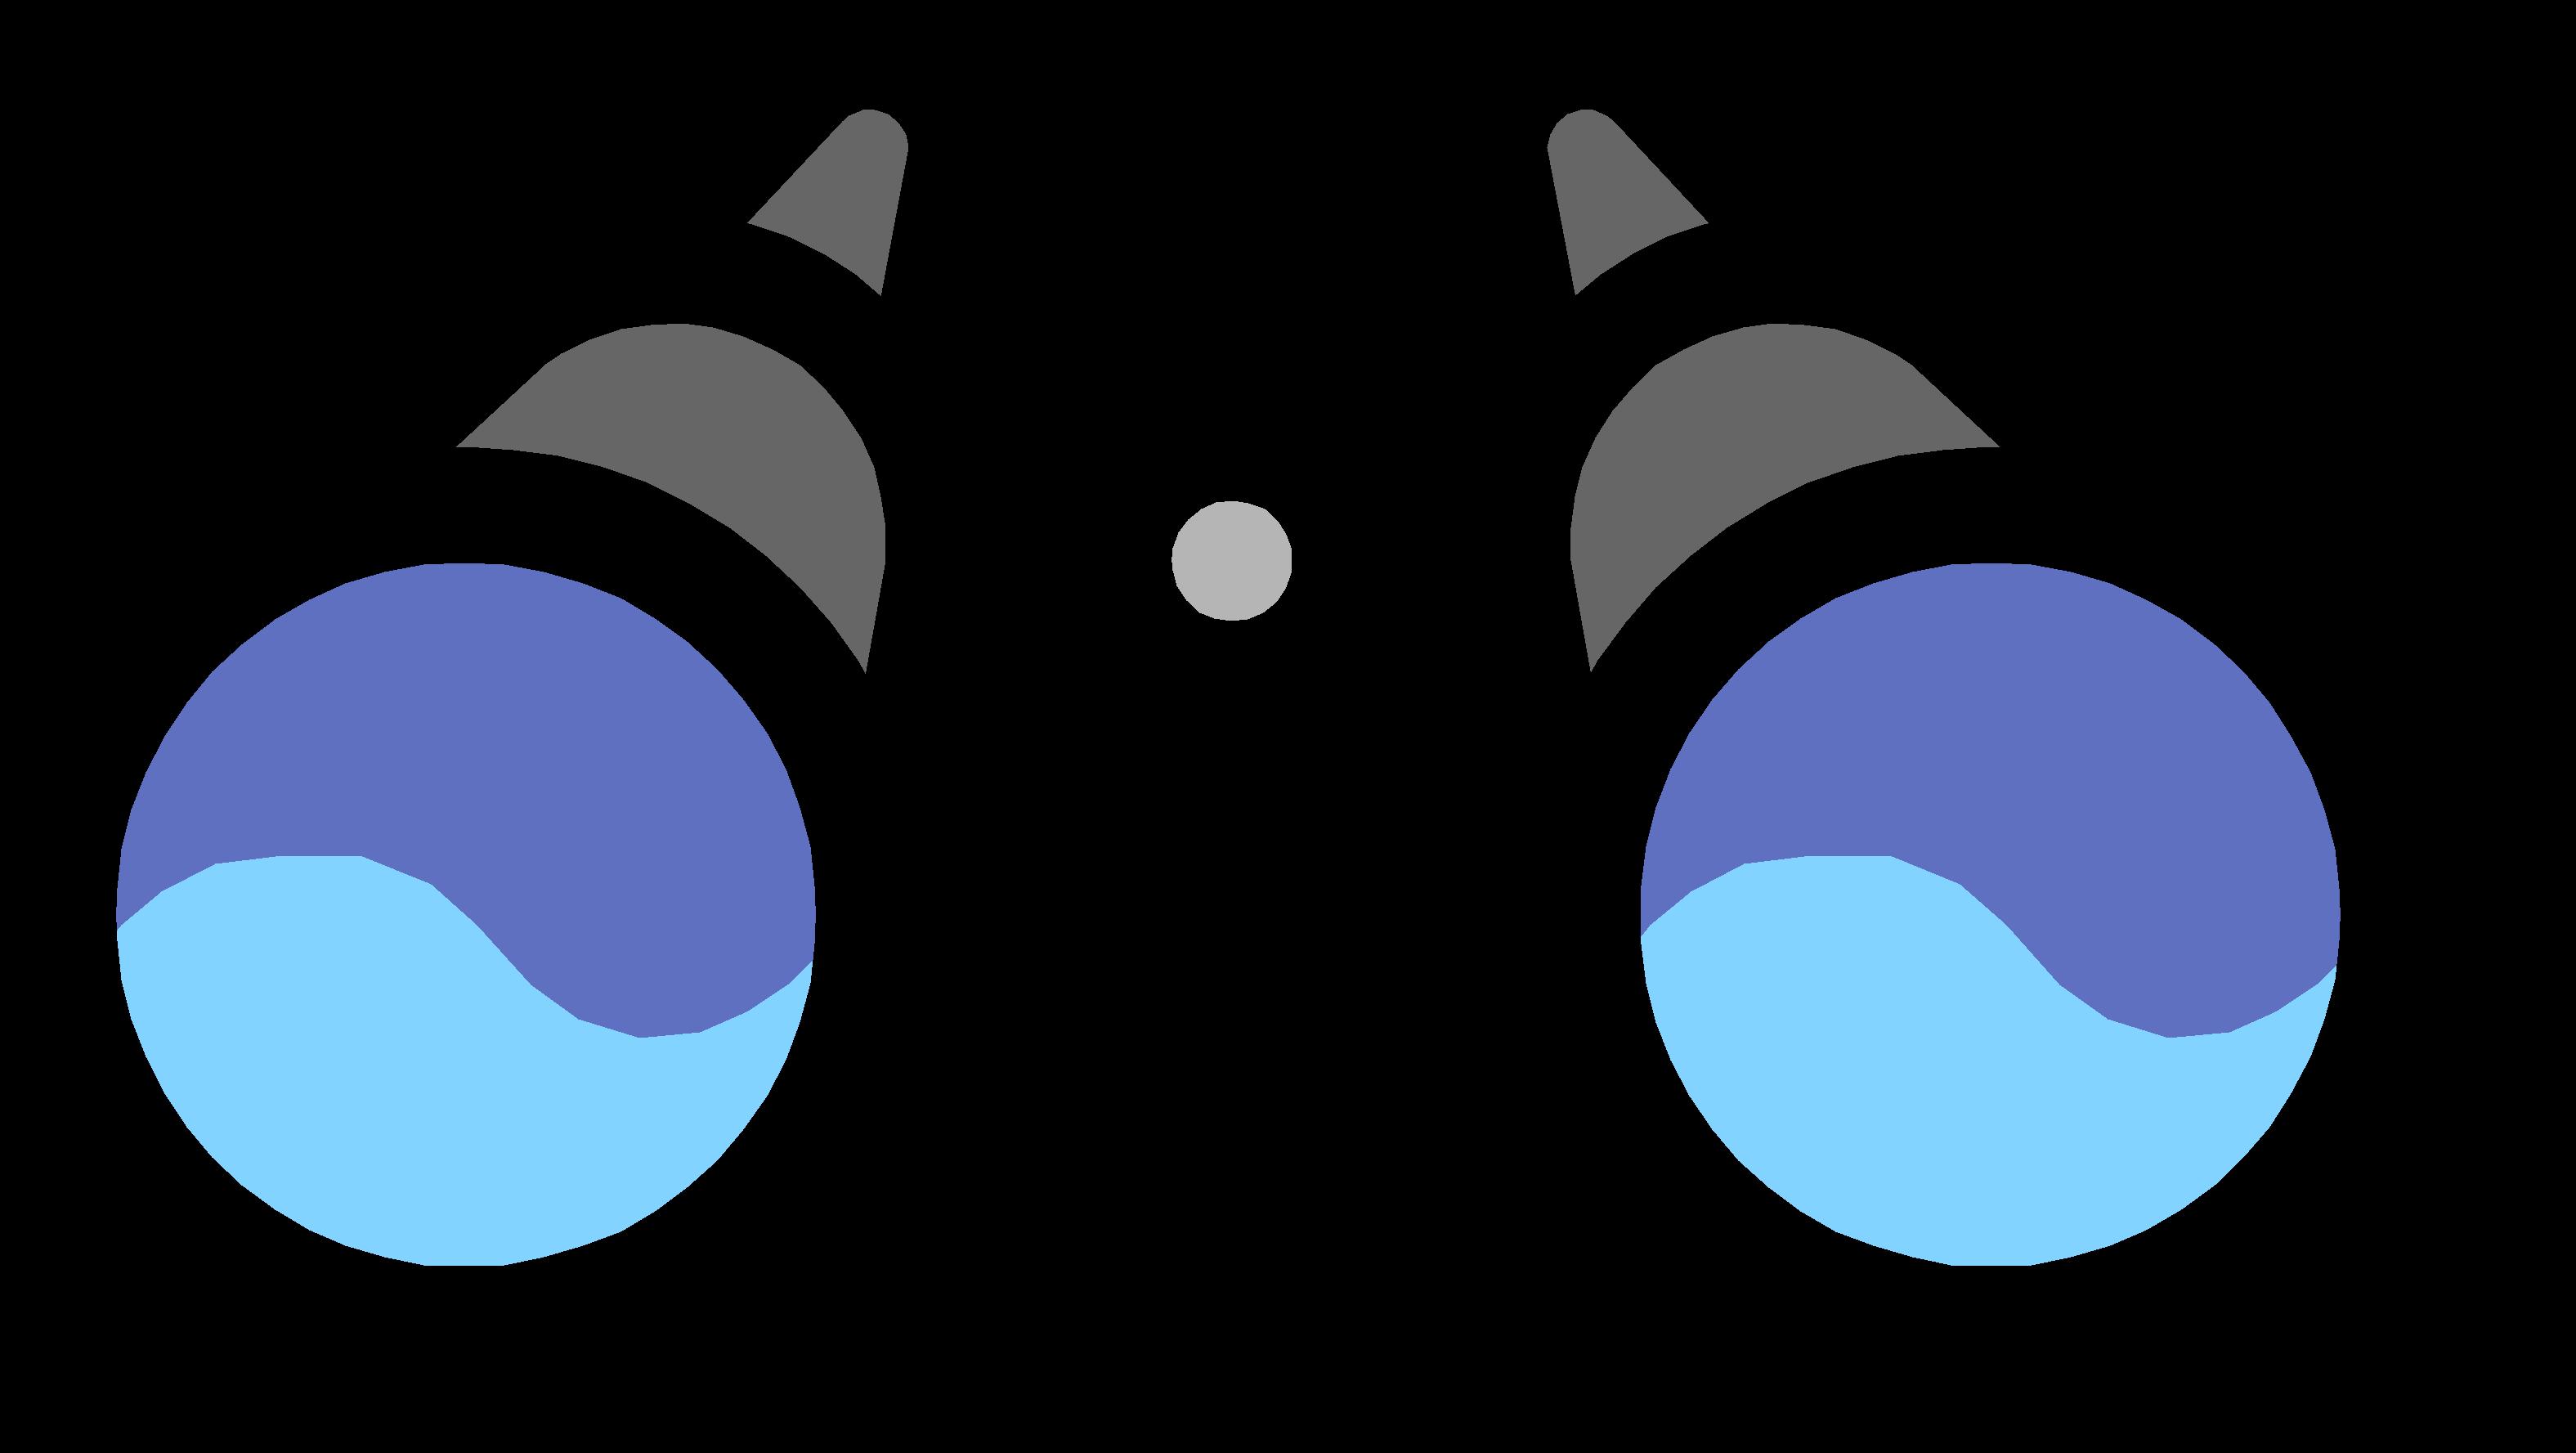 Vision clipart binoculars. Windows metafile clip art